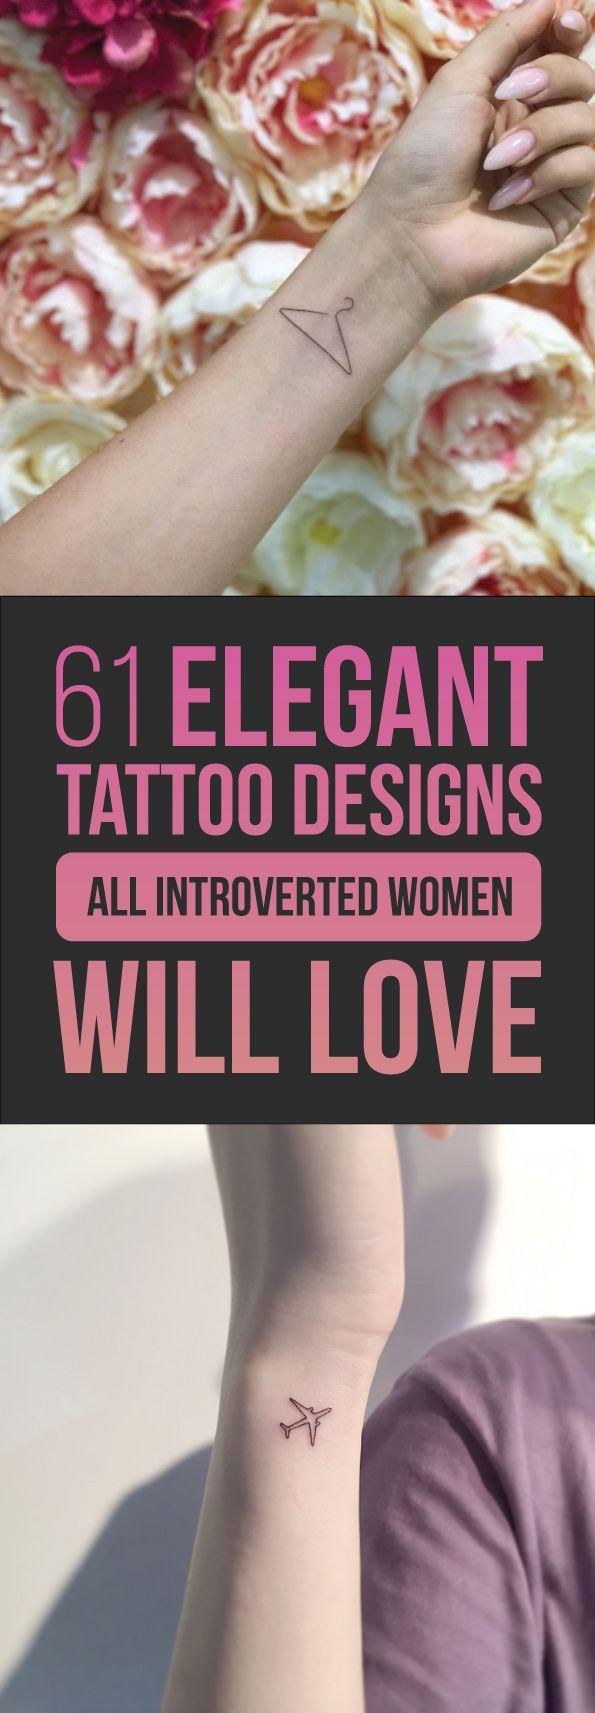 61 Elegant Tattoo Designs All Introverted Women Will Love